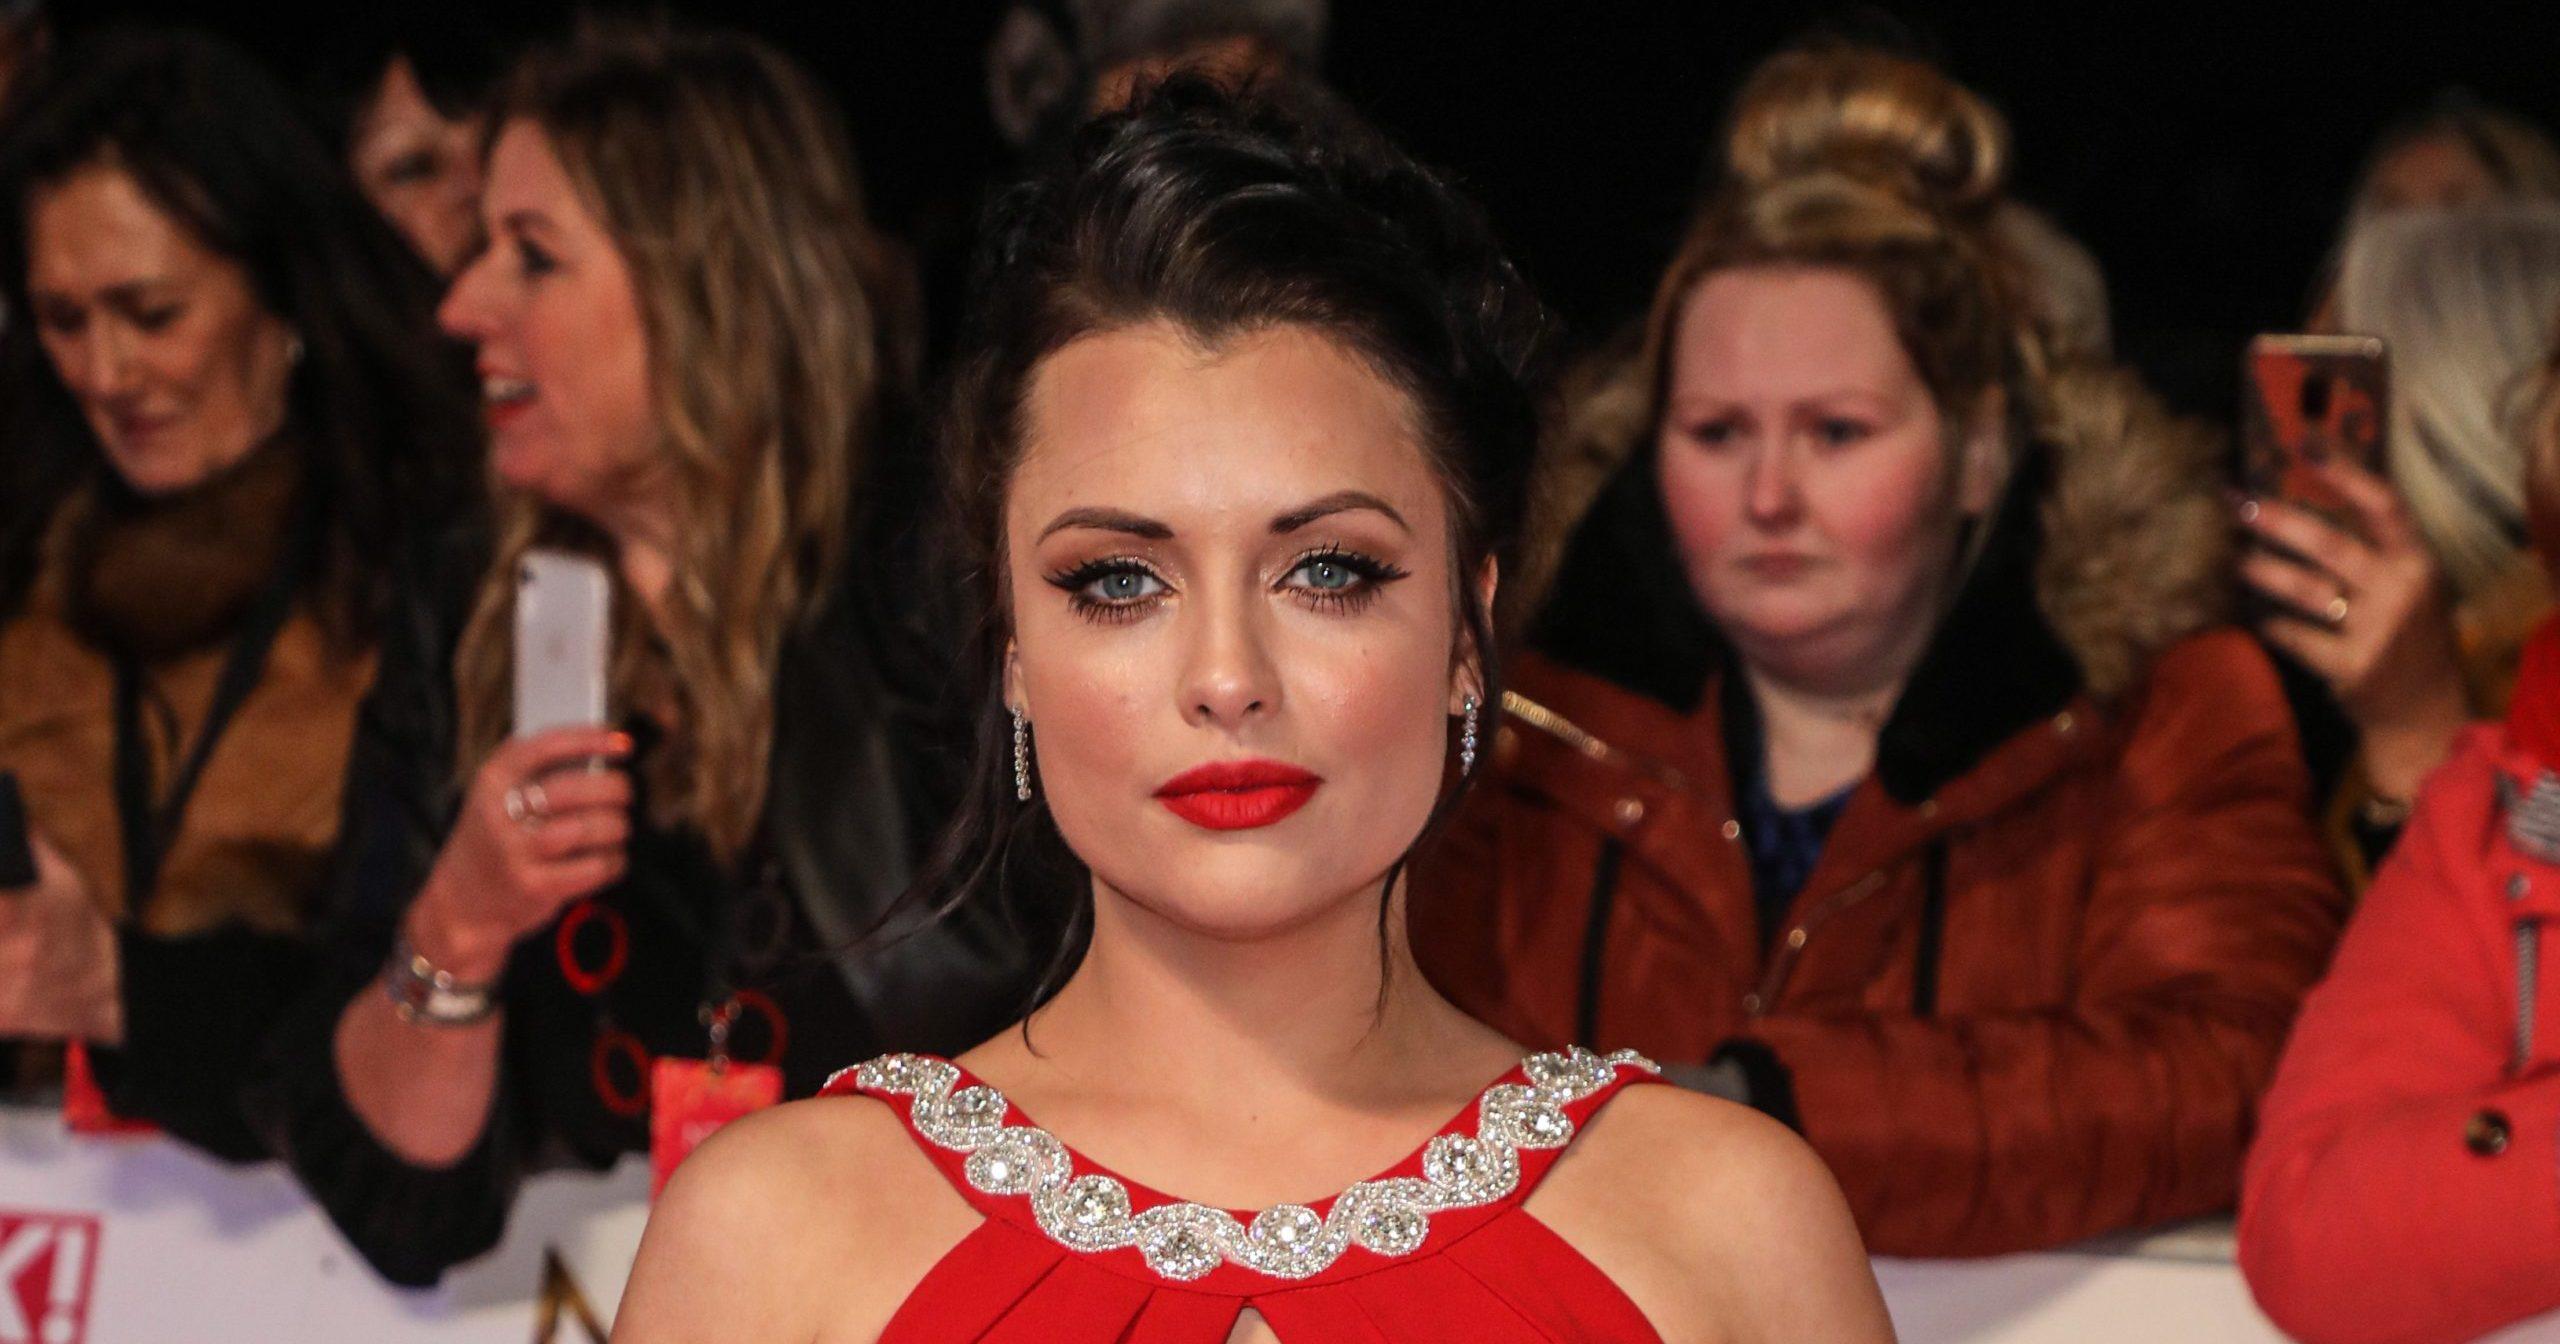 EastEnders star Shona McGarty shocks fans with 'lookalike' sister